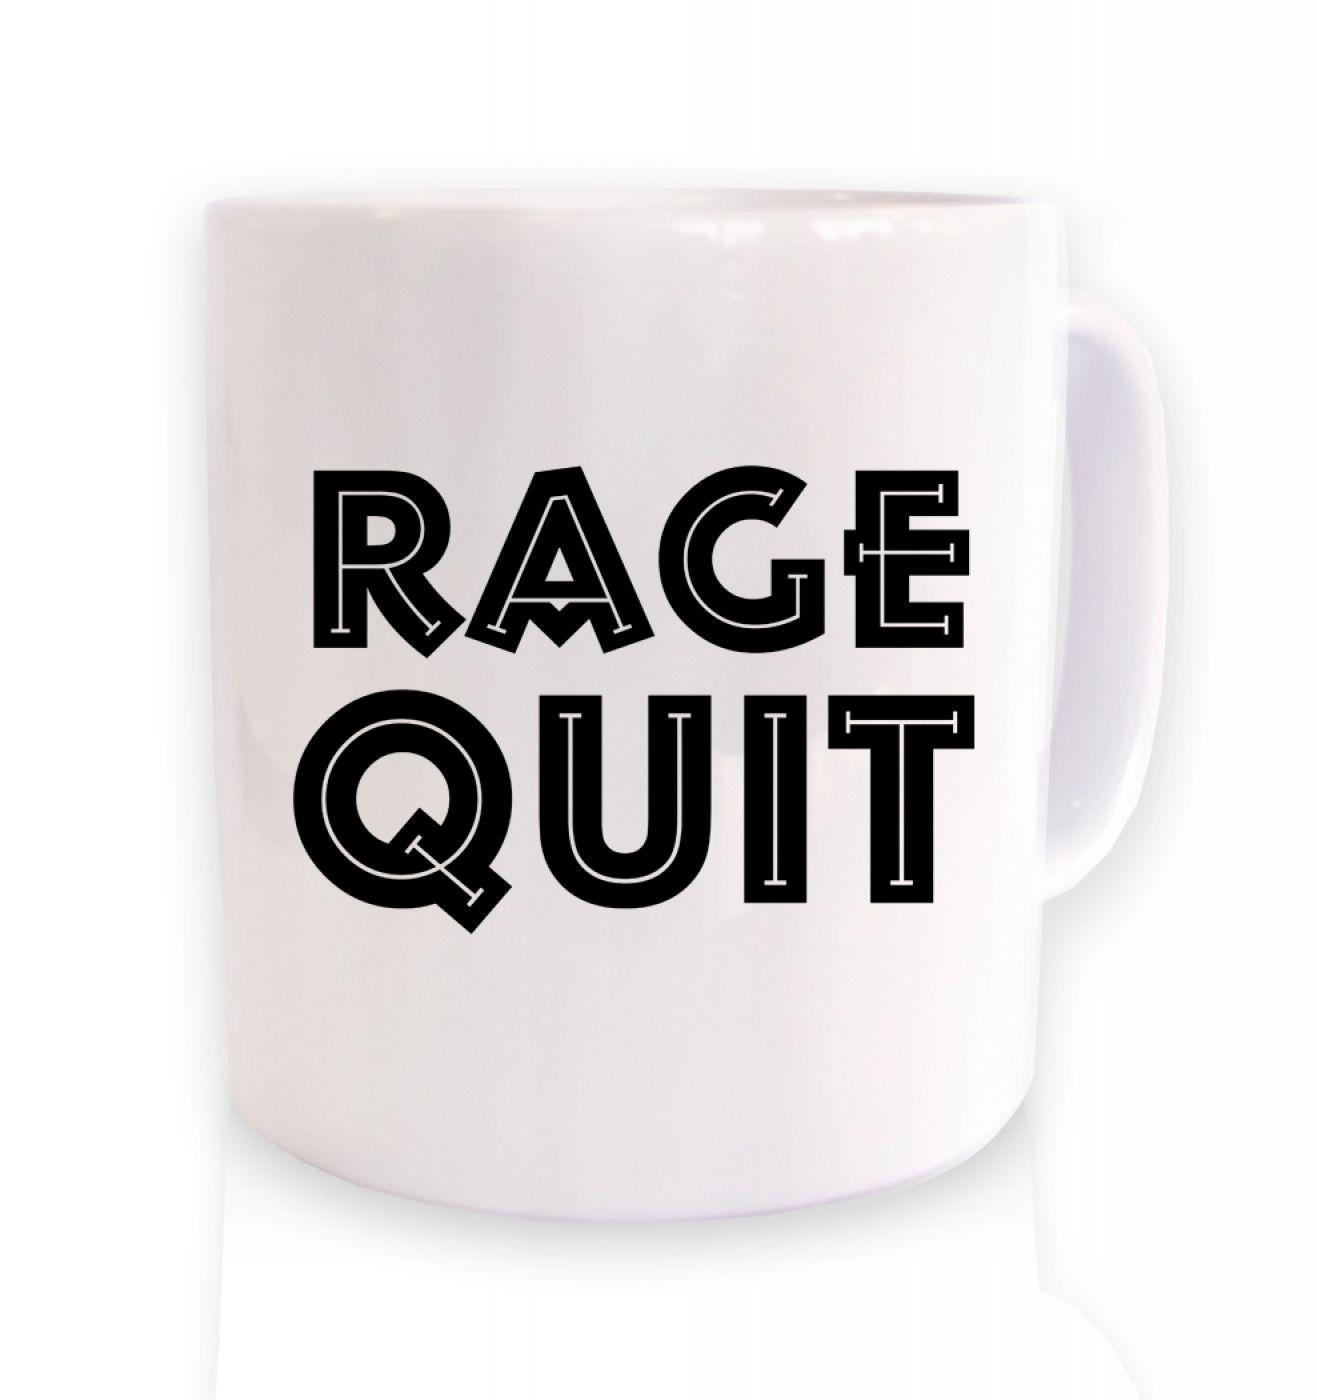 Rage Quit coffee ceramic coffee mug